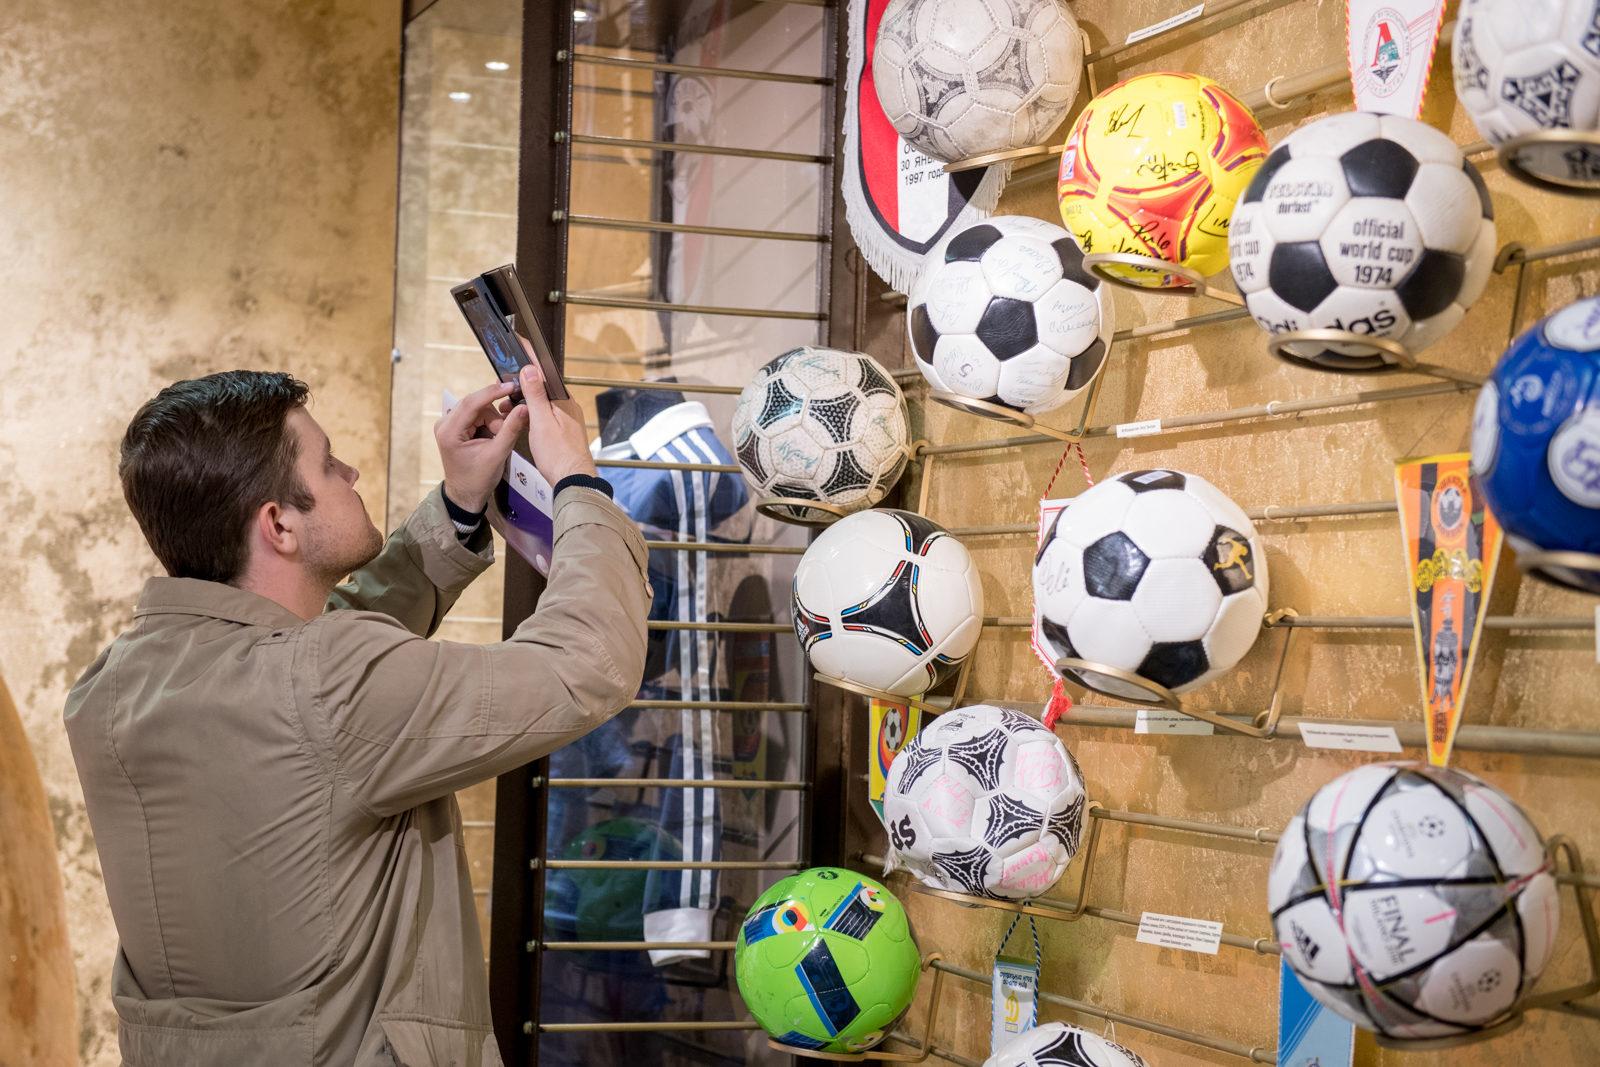 Онлайн-встреча «Космос и спорт – на Земле и орбите» – события на сайте «Московские Сезоны»